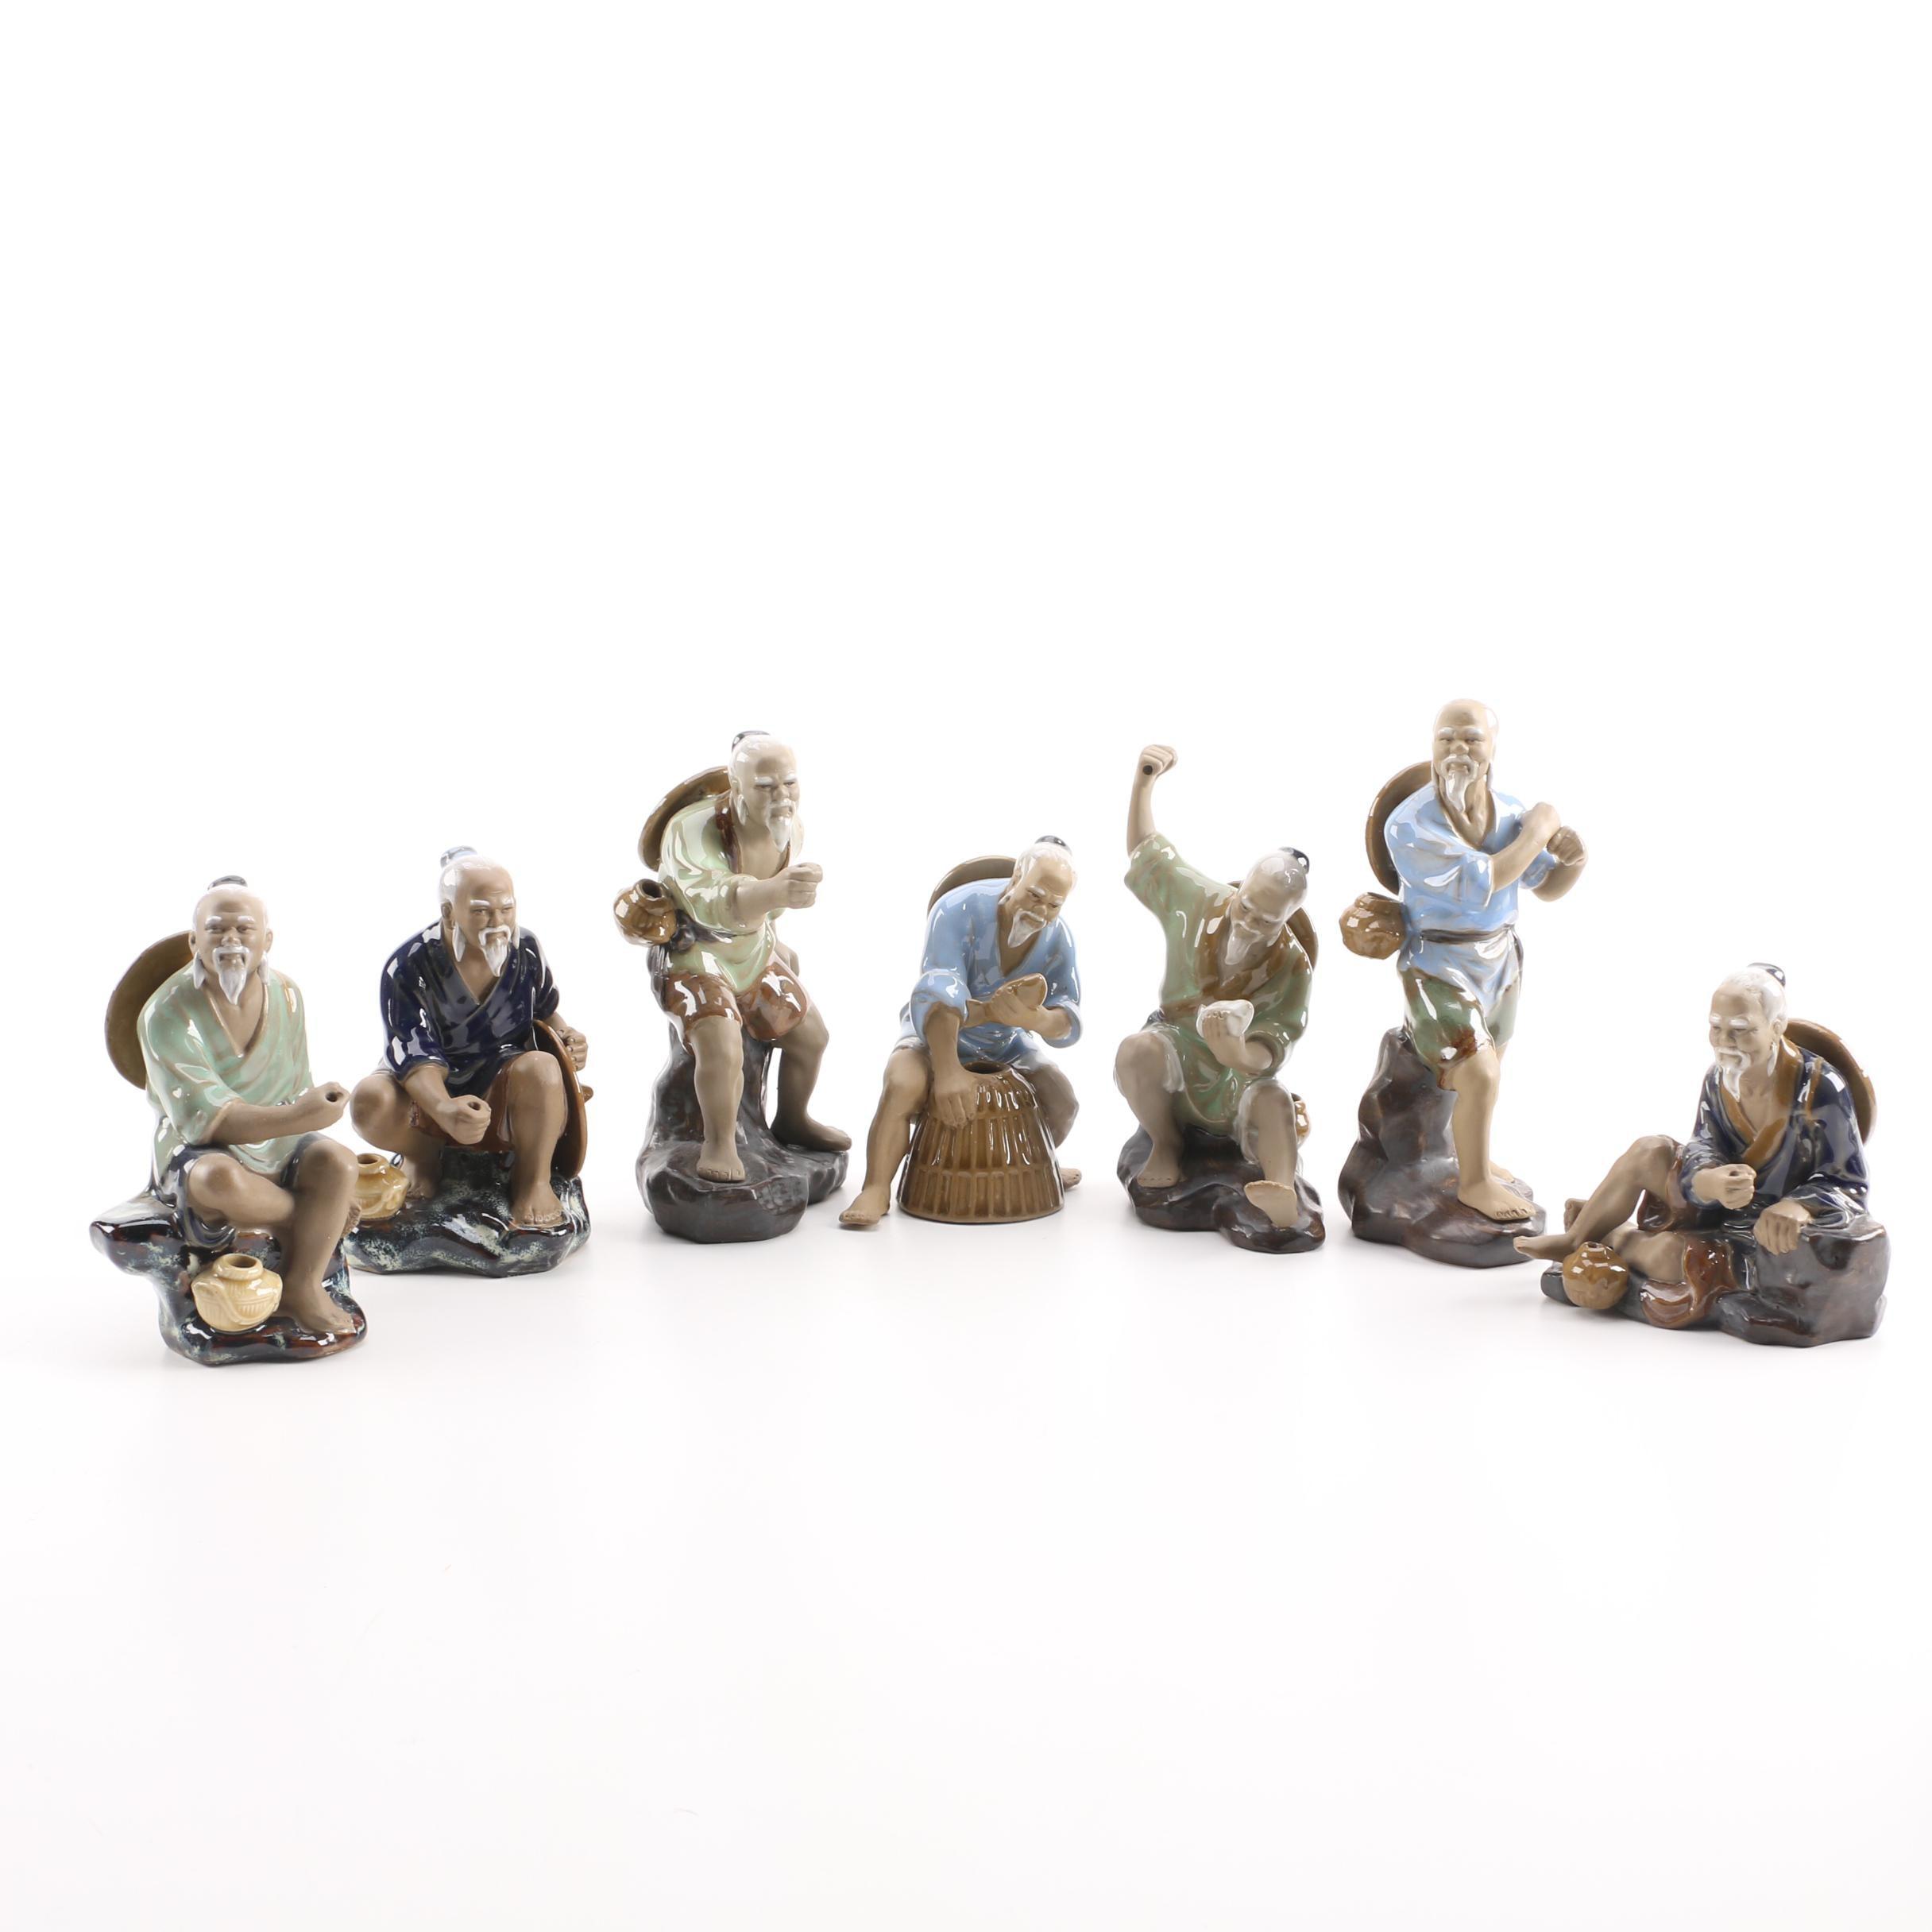 Contemporary Chinese Ceramic Fisherman Figurines